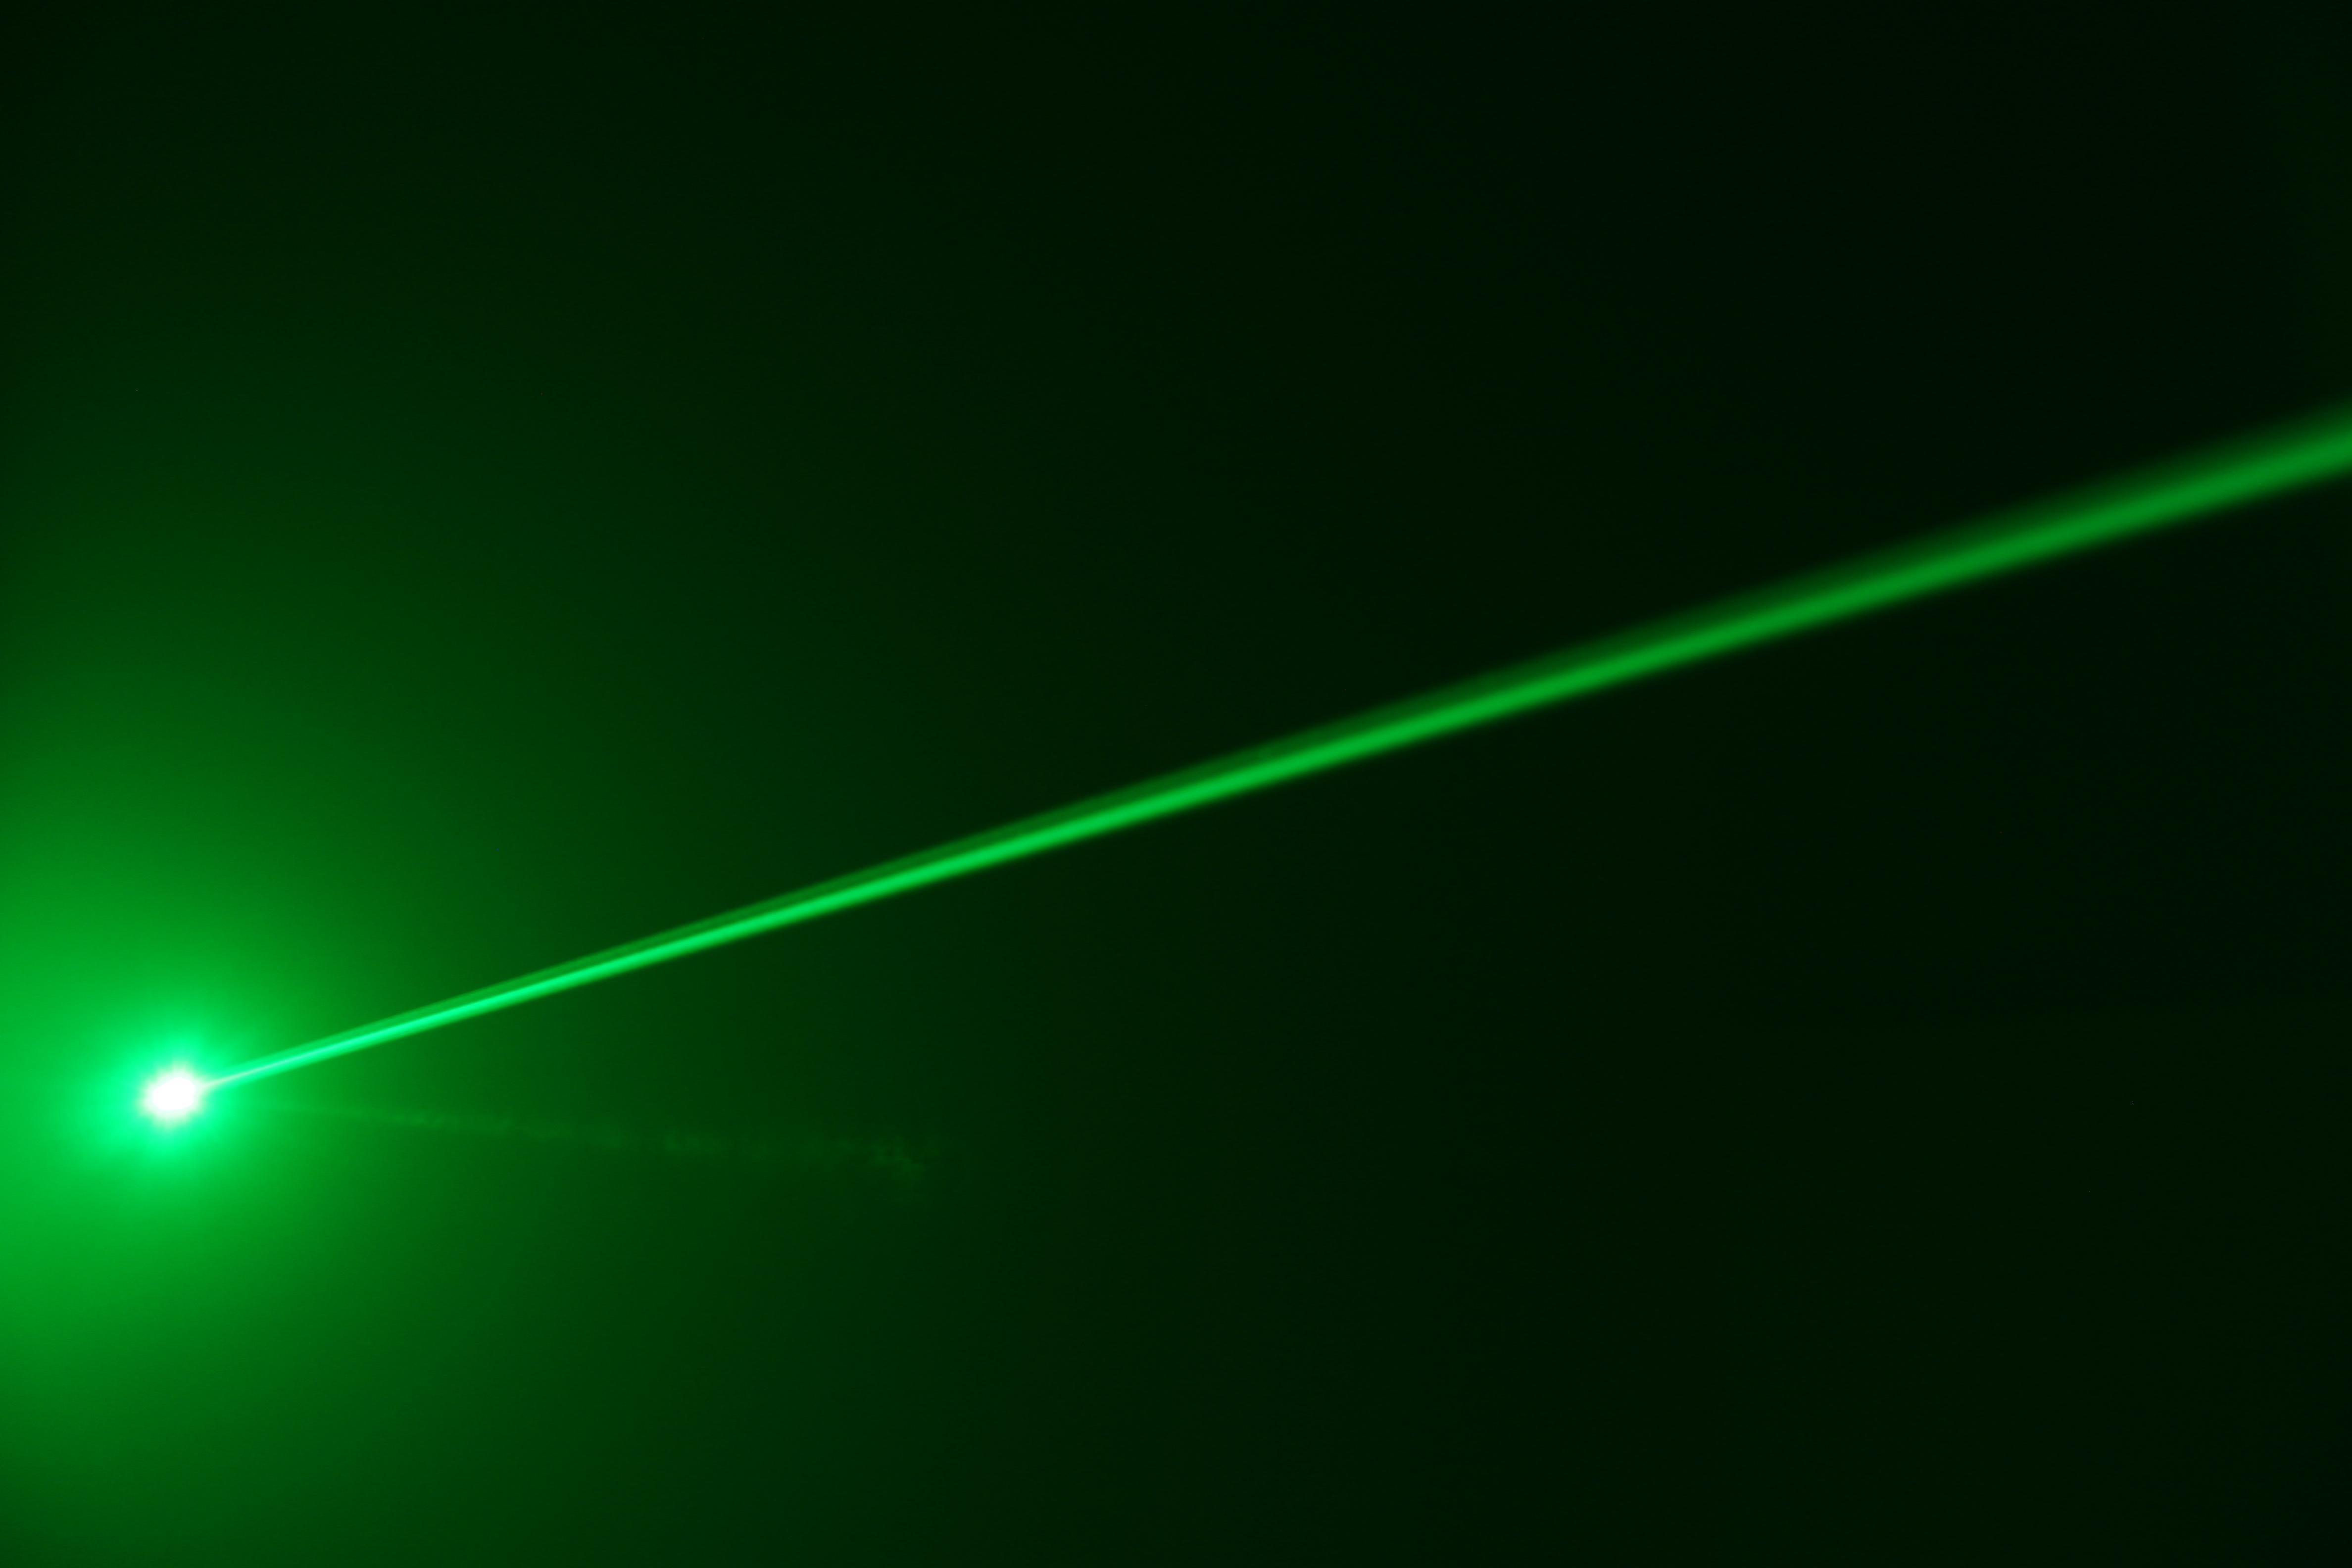 High Resolution Wallpaper | Laser 4752x3168 px